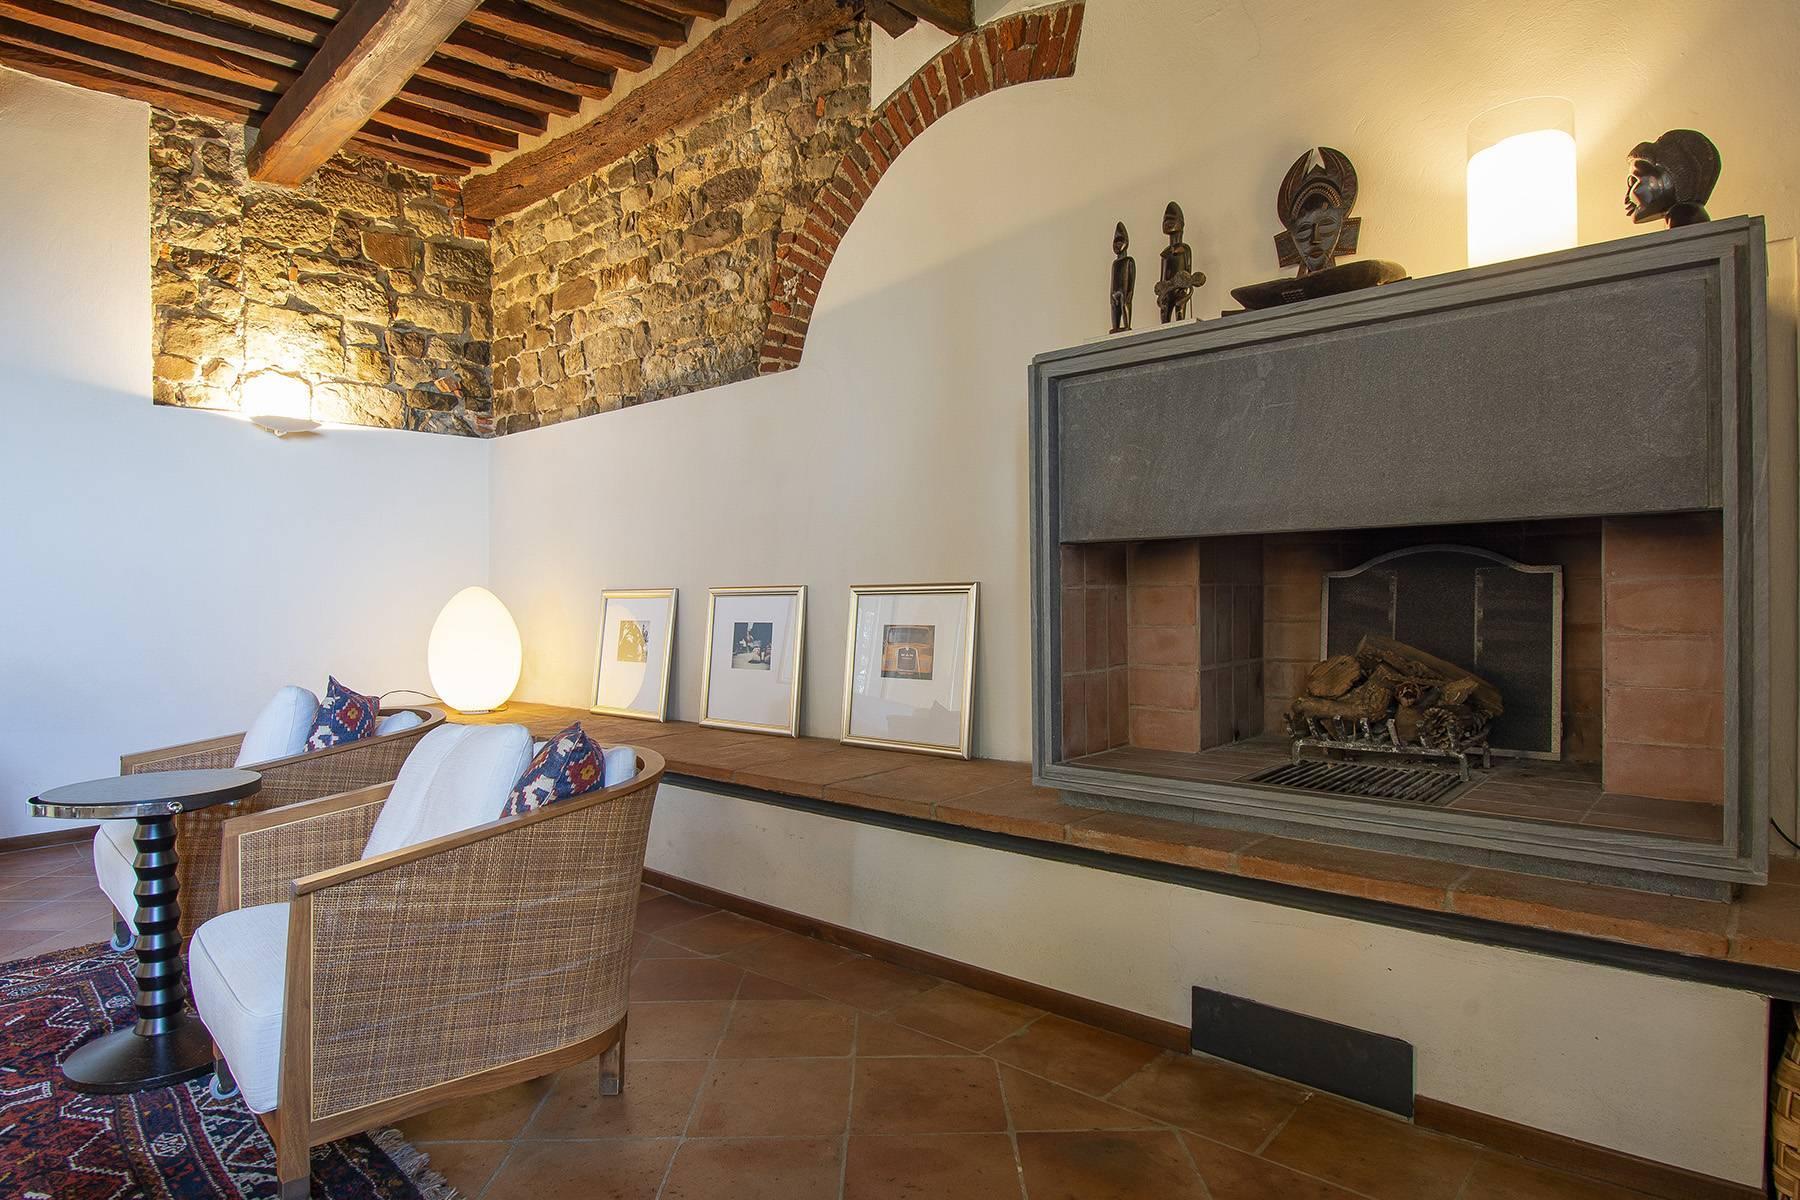 Stunning country villa nestled on the hills - 5